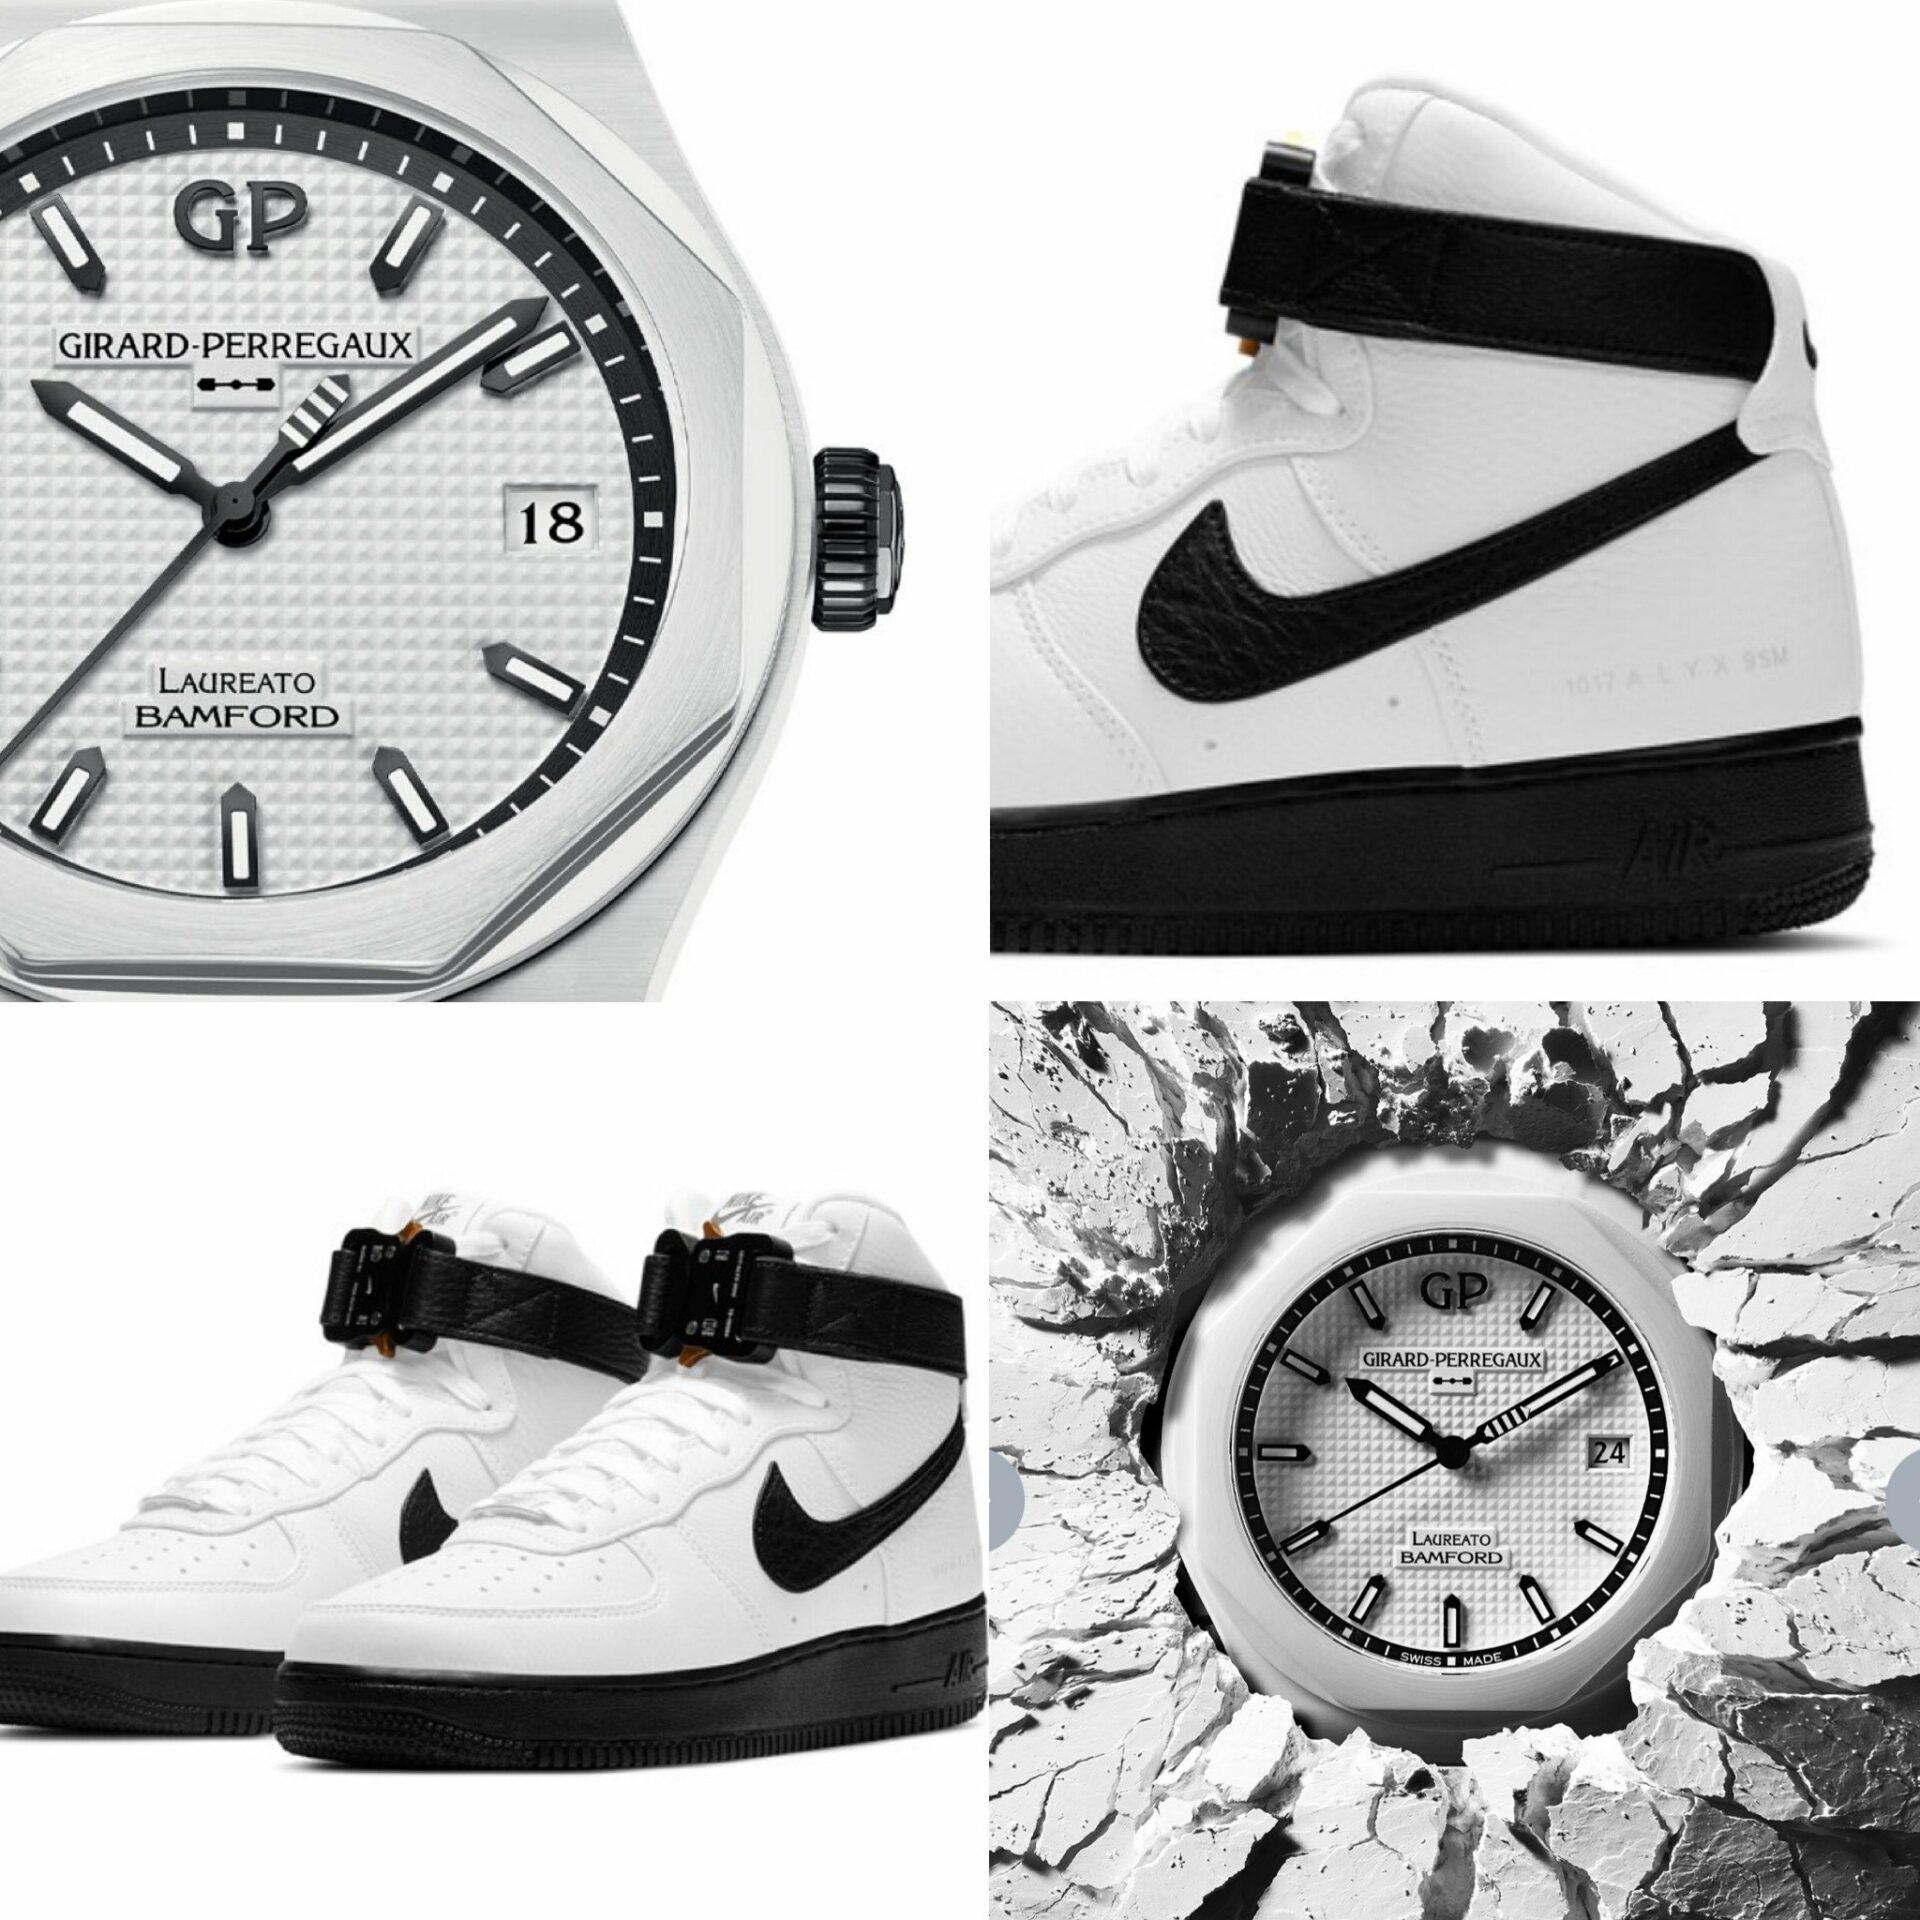 #Kicktock: White-hot drops this week from Bamford and Nike create monochromatic magic